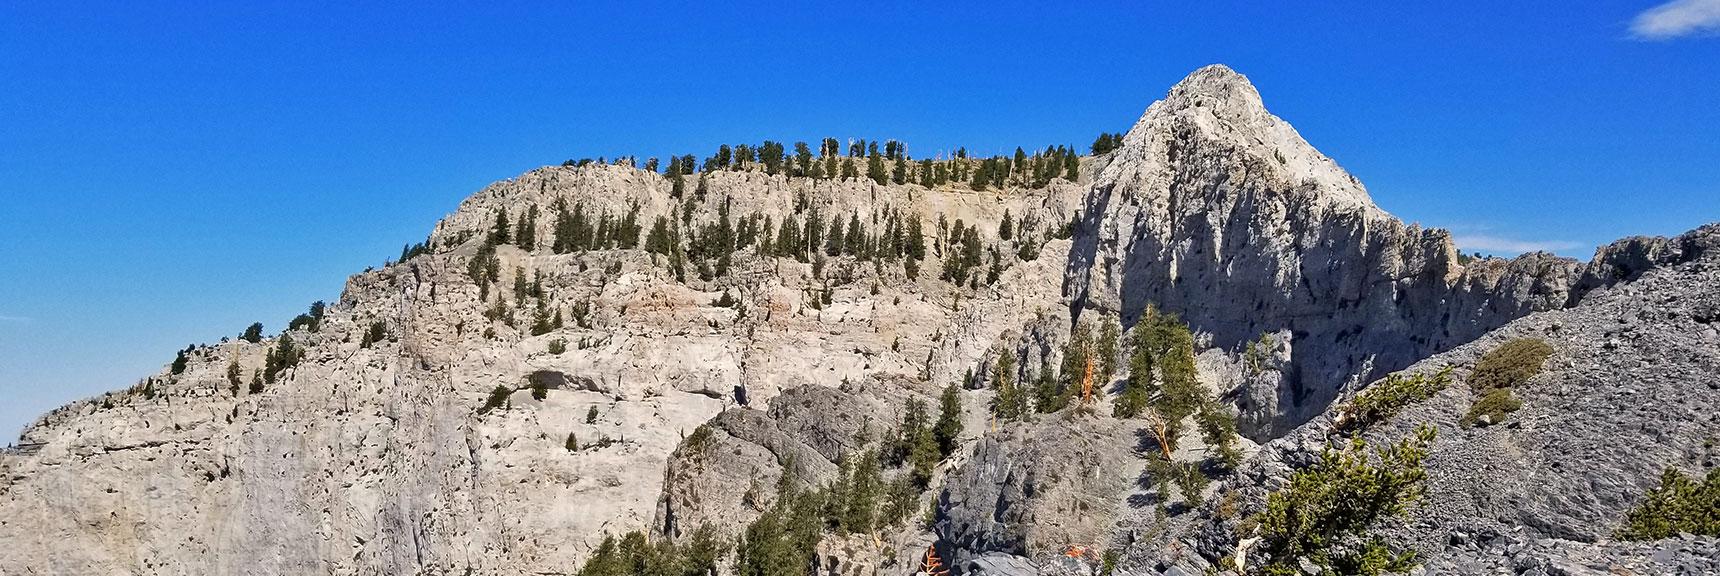 Mummy Mountain from Mummy's Knees | Mummy Mountain's Knees | Mt. Charleston Wilderness, Nevada 028